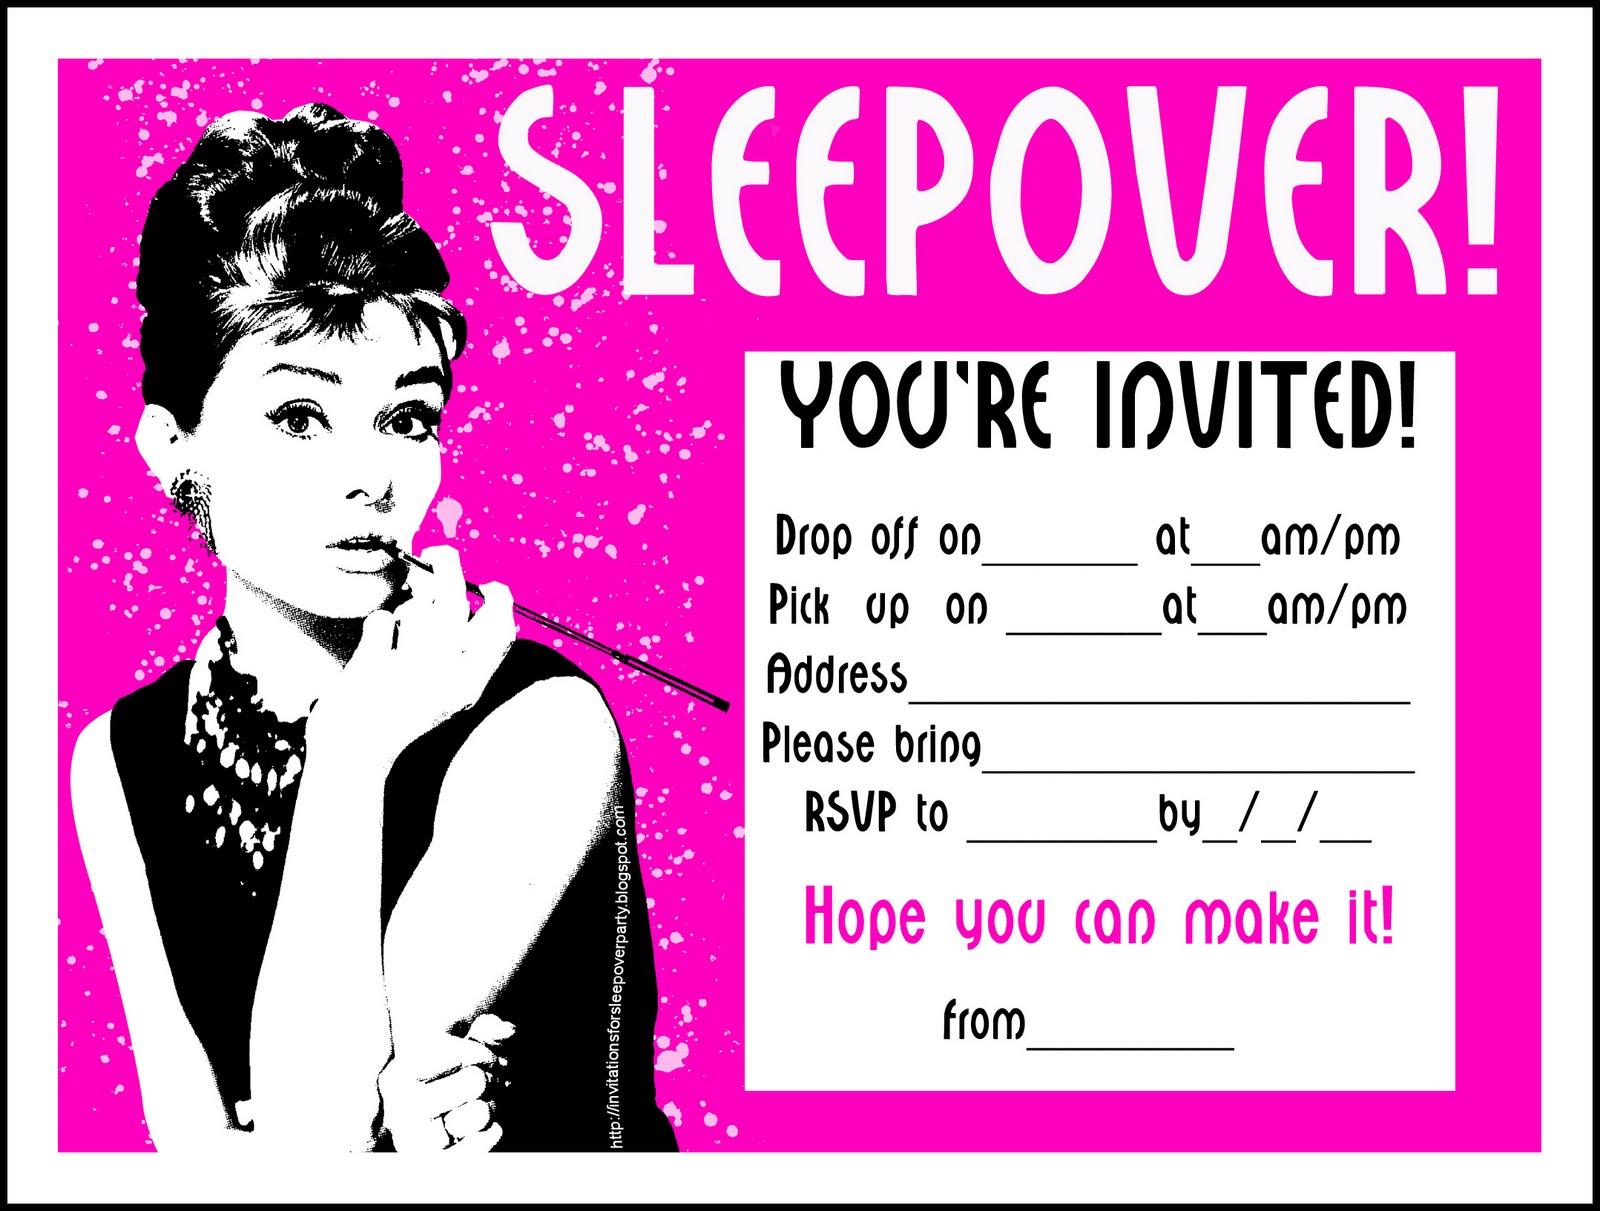 sleepover invitation template com sleepover invitation template sleep over printable